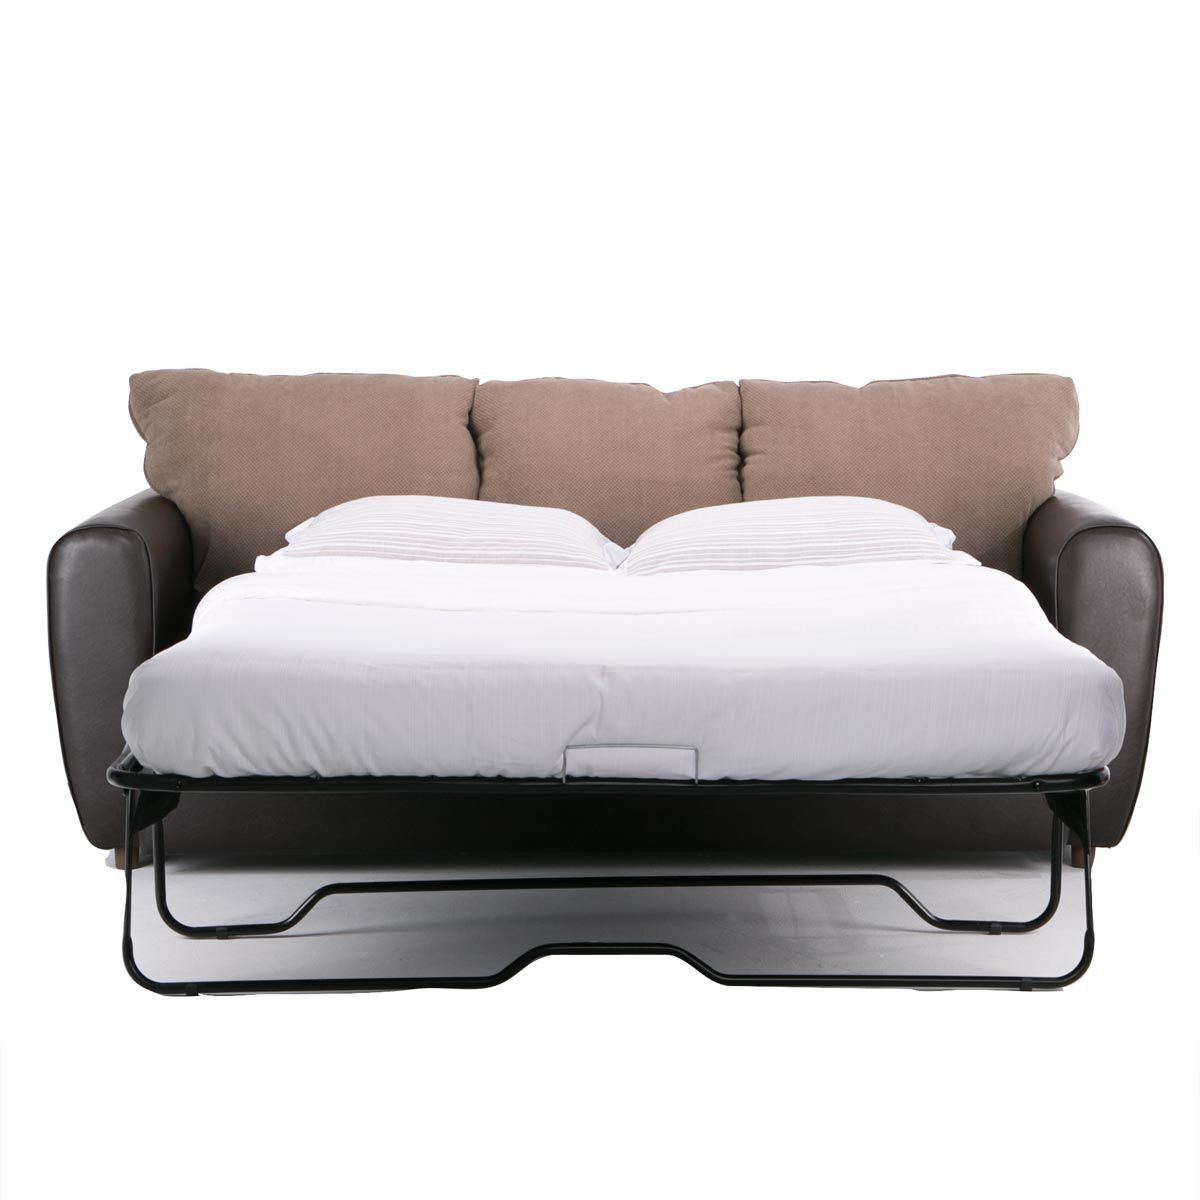 London queen sleeper sofa she shed ideas pinterest sleeper